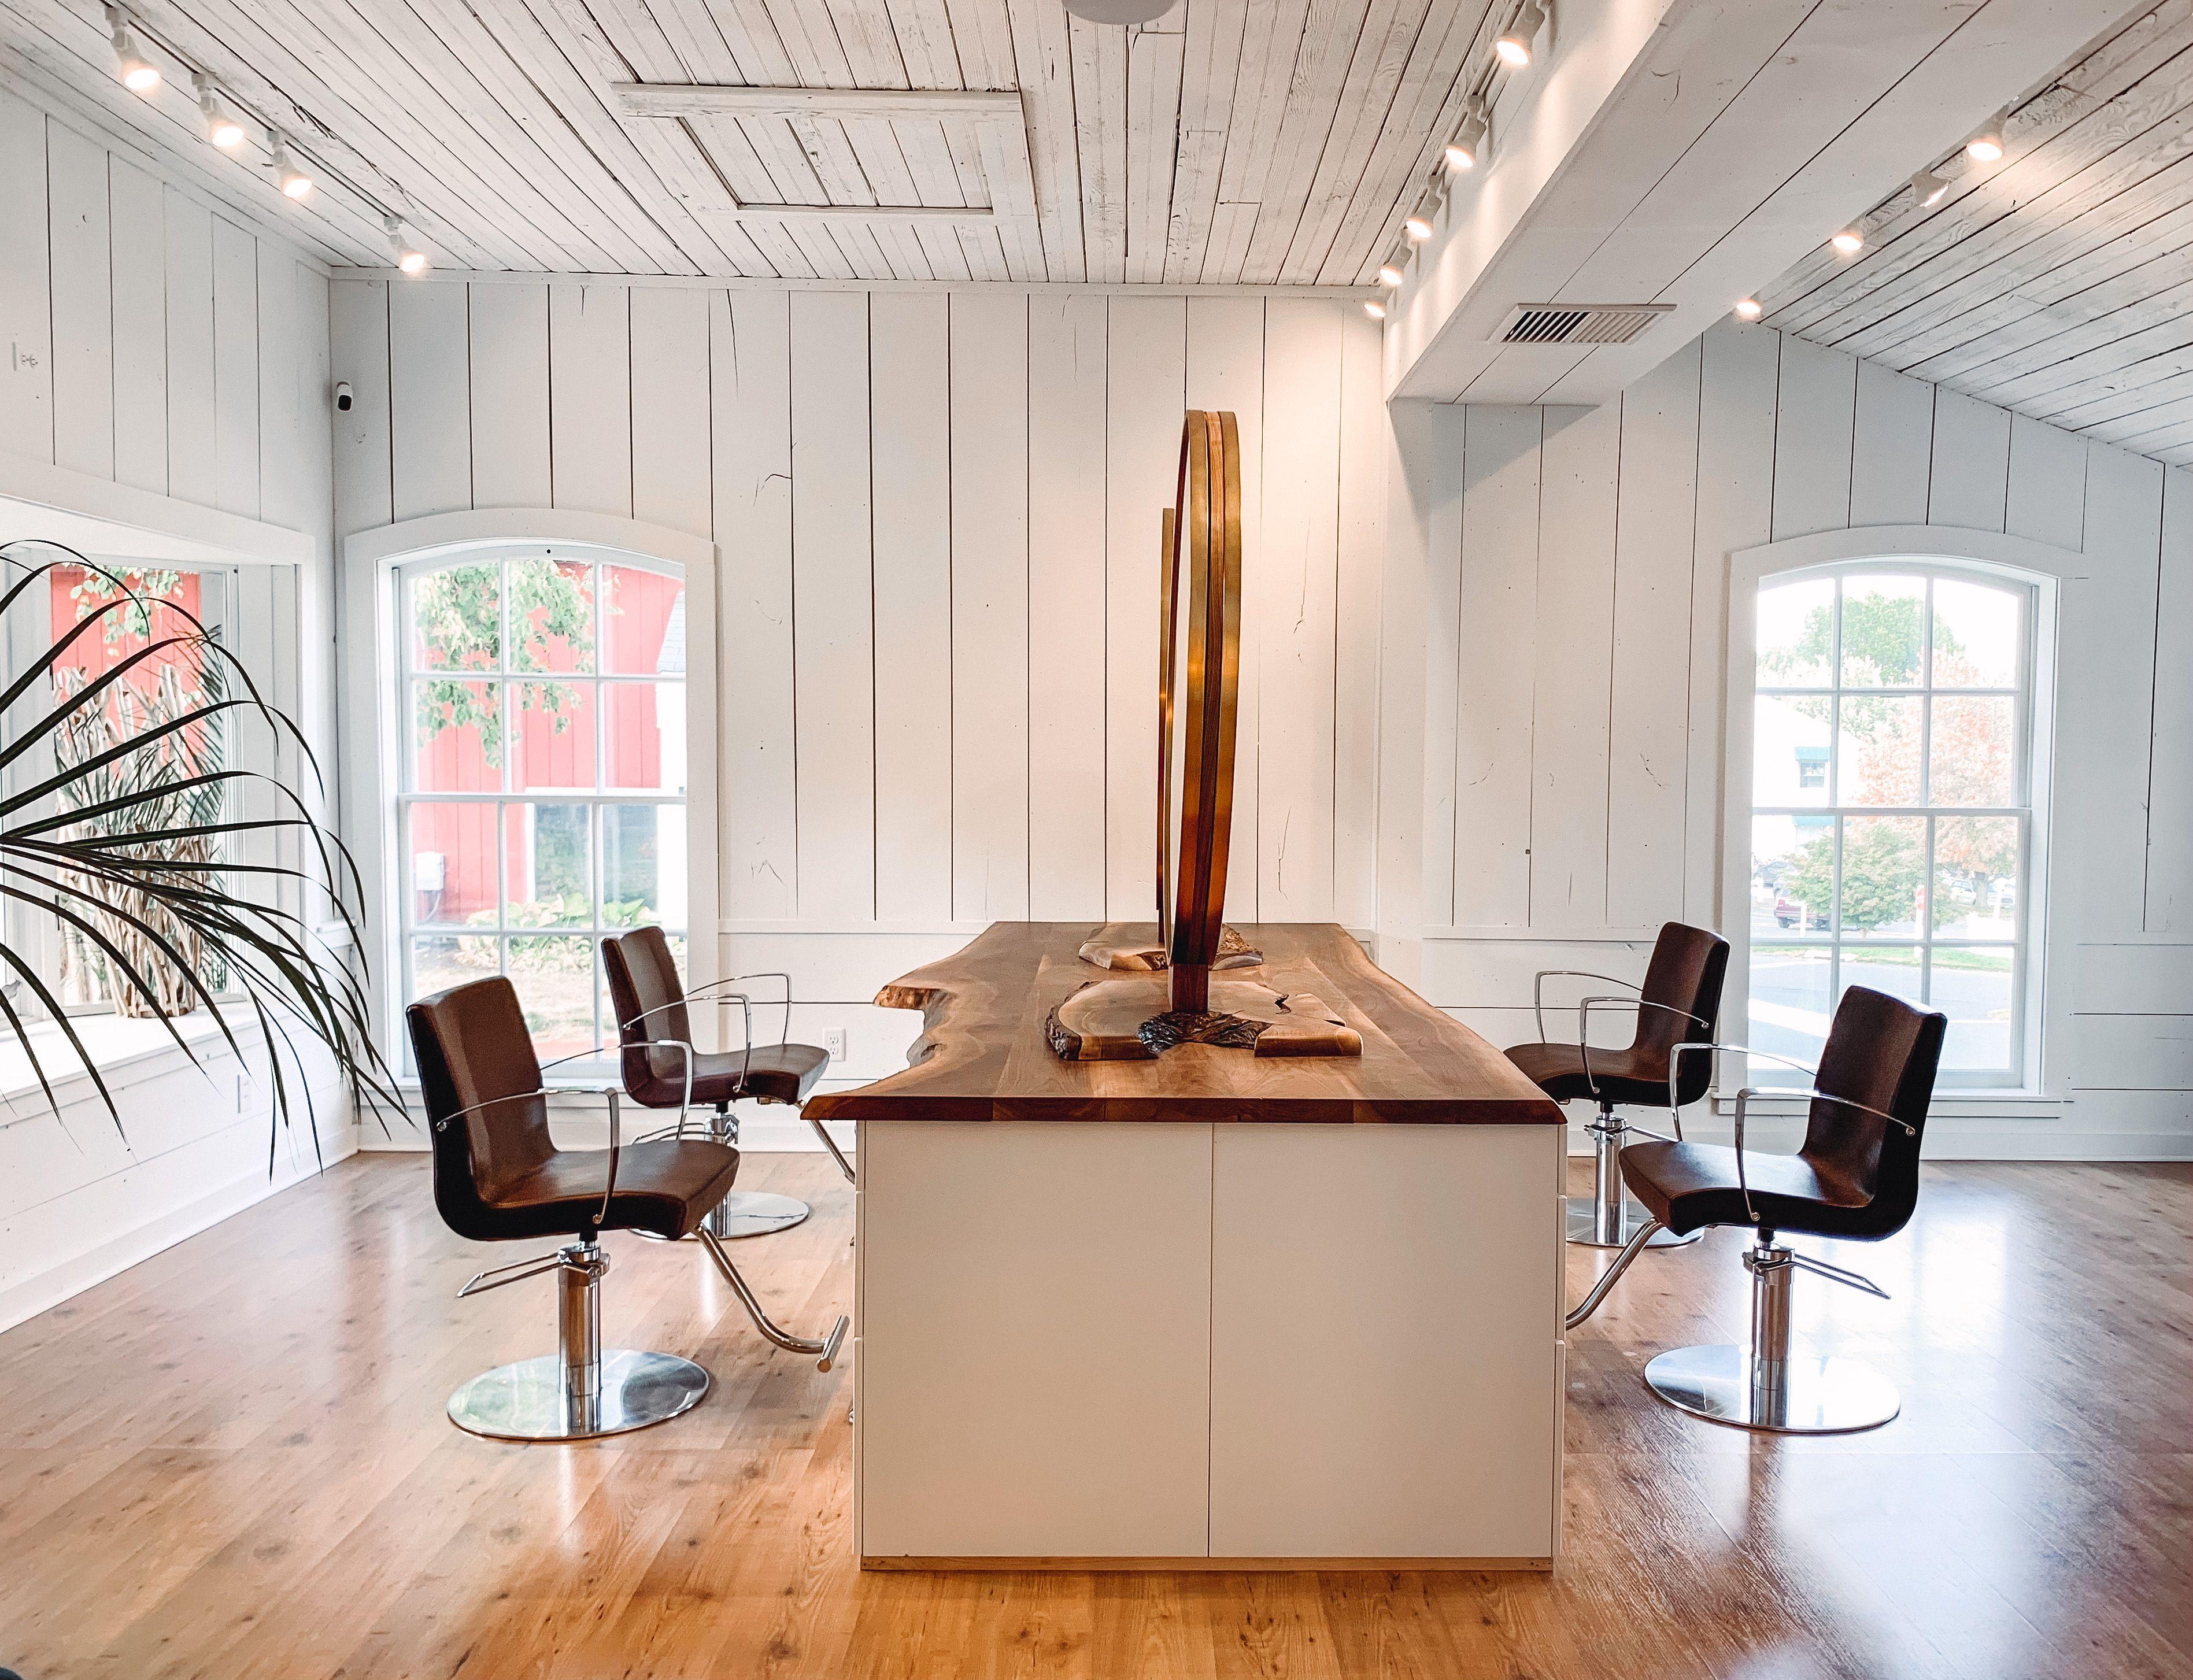 OPAL salon in Avon, CT Beach vibes, white interior, with all custom black walnut. Escape reality #whitesalon #beachvibes #salondecor #salon #modern #minimalistic #hairsalon #salondesign #design #interiordesign #liveedge #woodslab #liveedge #blackwalnut #opal #opalsalon #saloninterior